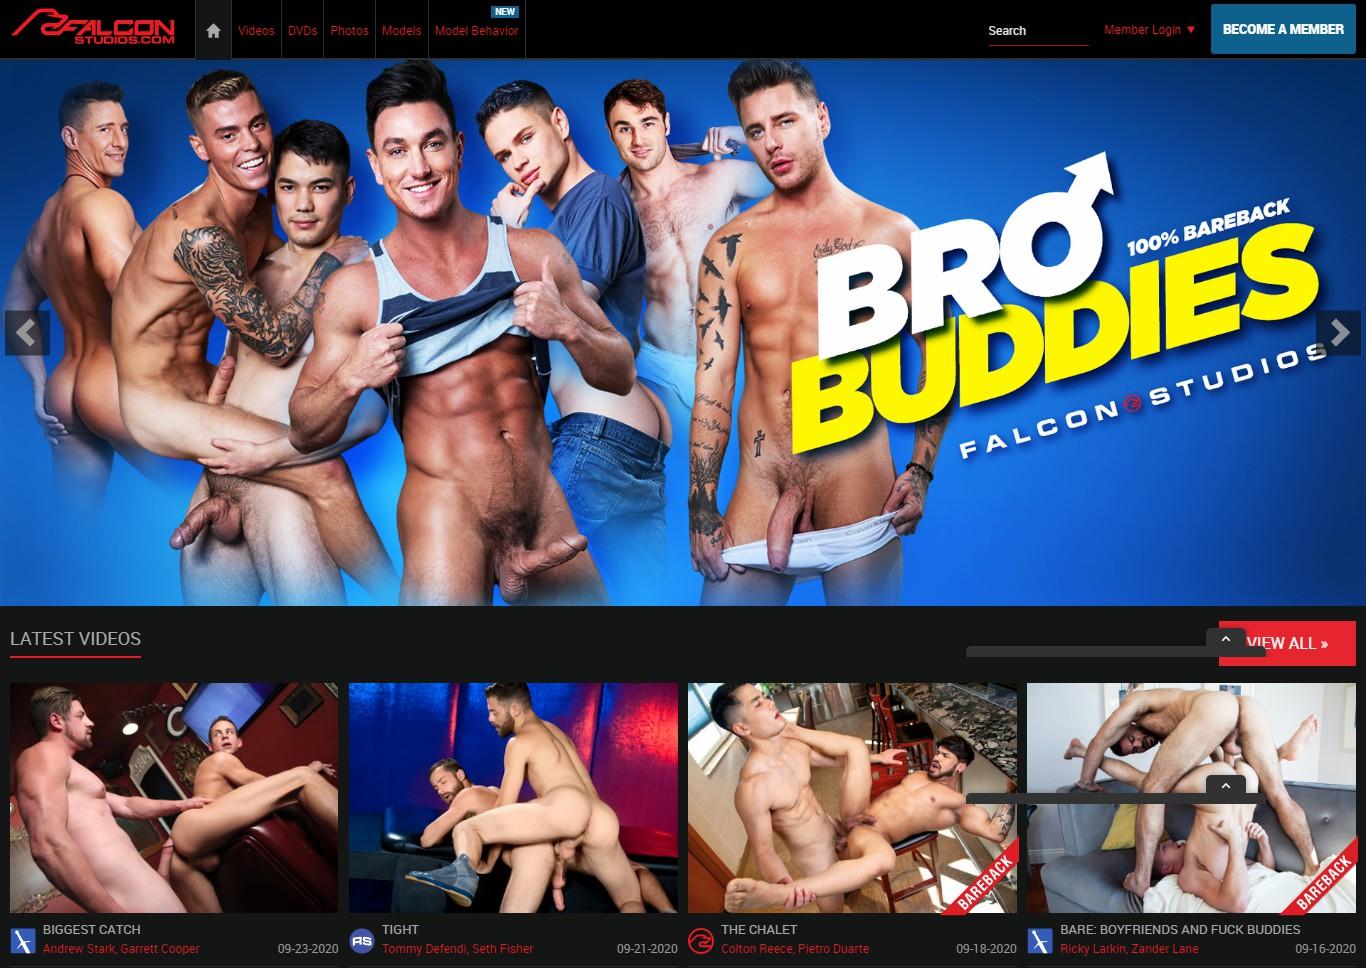 FalconStudios - Best Premium Gay Porn Sites